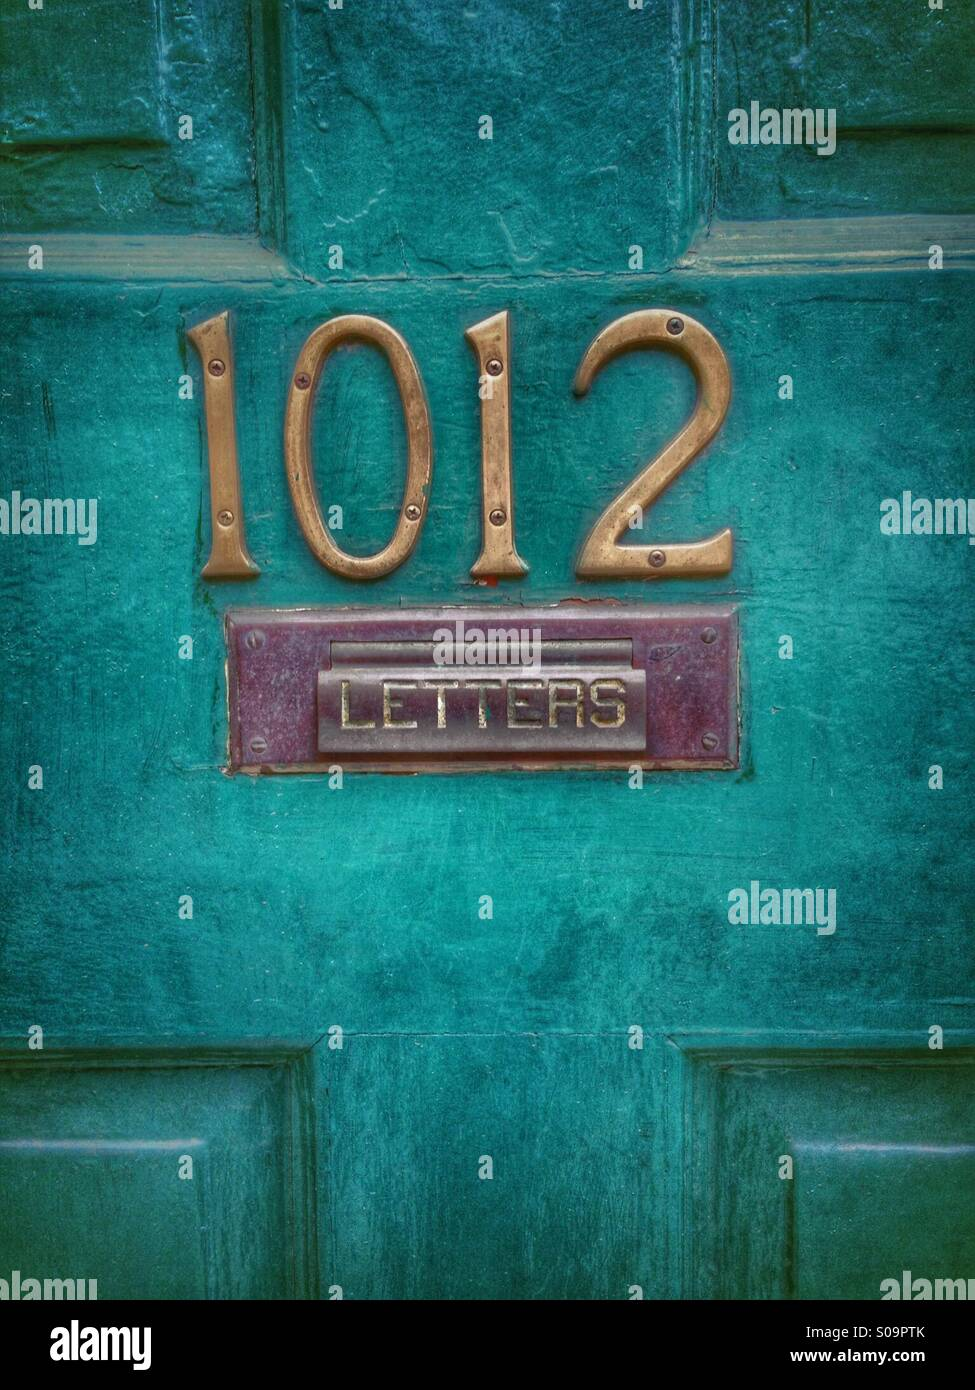 Letterbox en la antigua puerta. Imagen De Stock